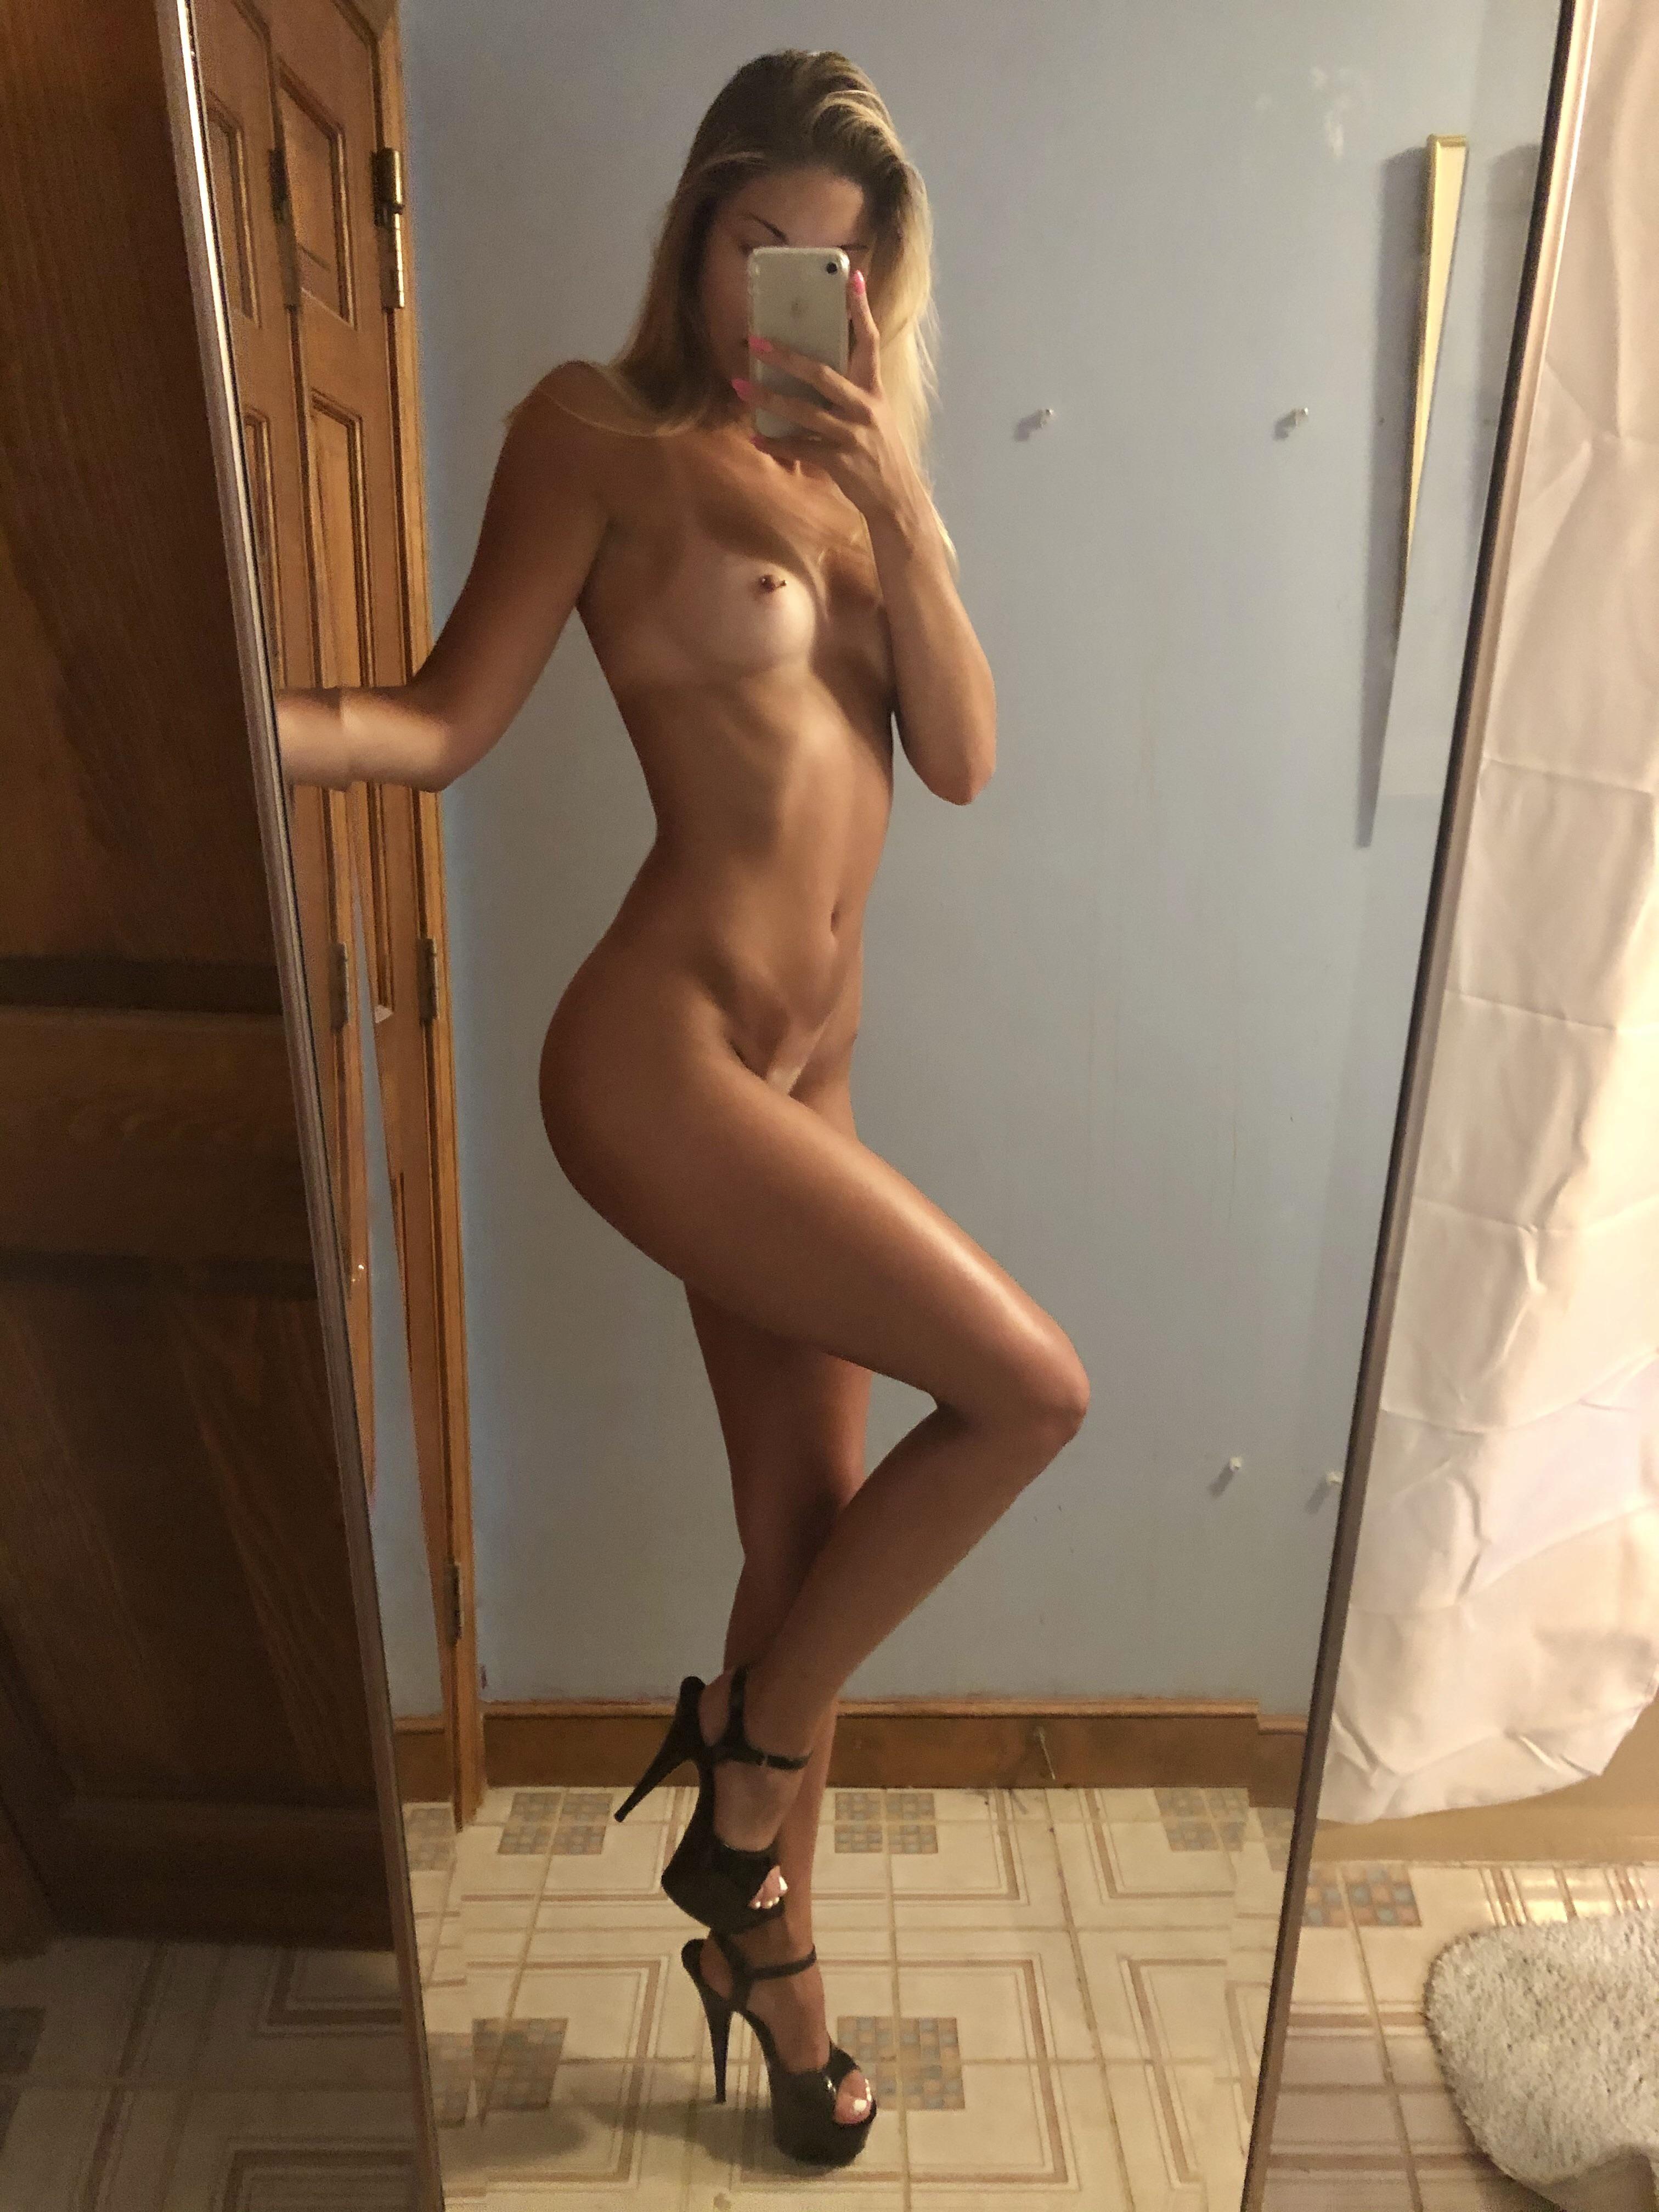 girls-naked-high-heels-pussy-mix-vol2-86